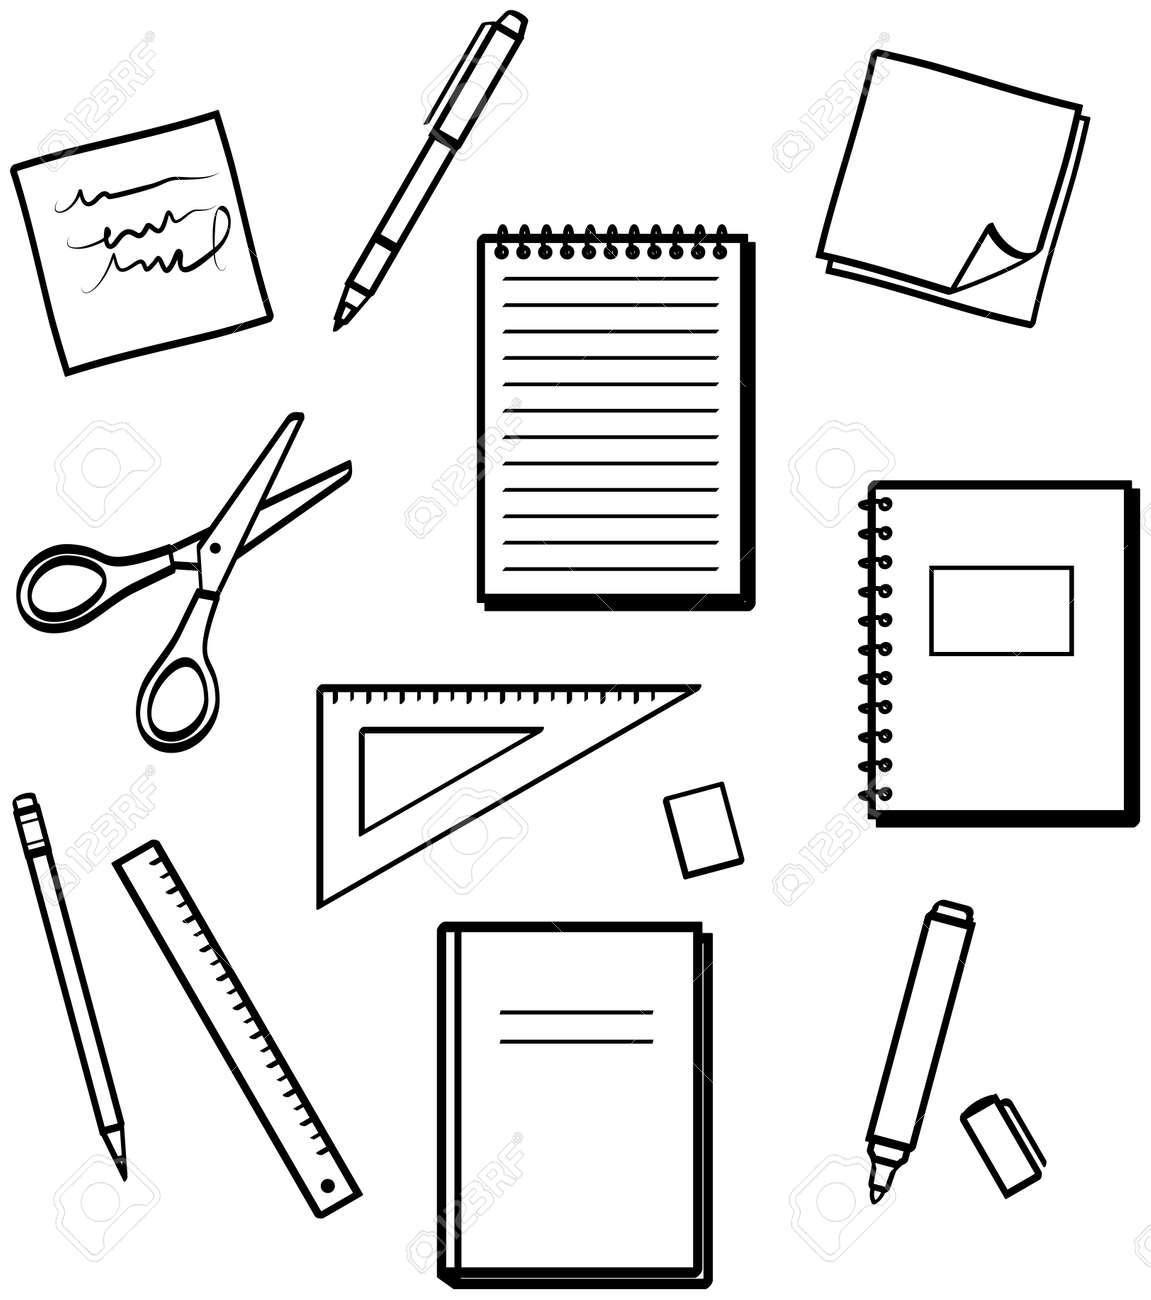 Bürobedarf clipart  Bürobedarf - Vector Illustrationen Lizenzfrei Nutzbare ...